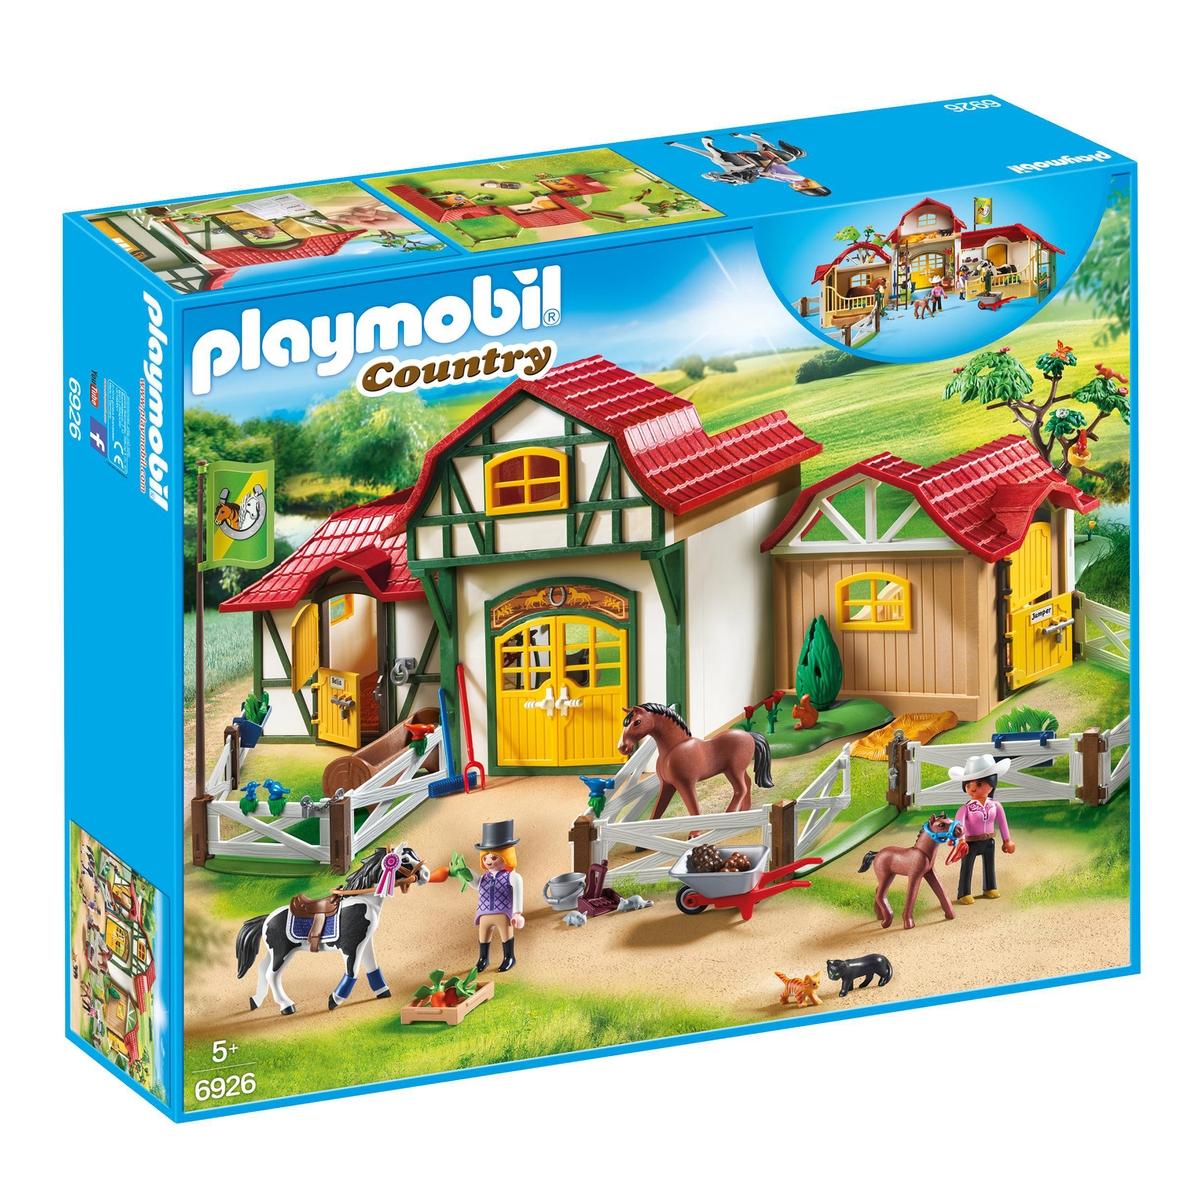 An image of Playmobil 6926 Horse Farm